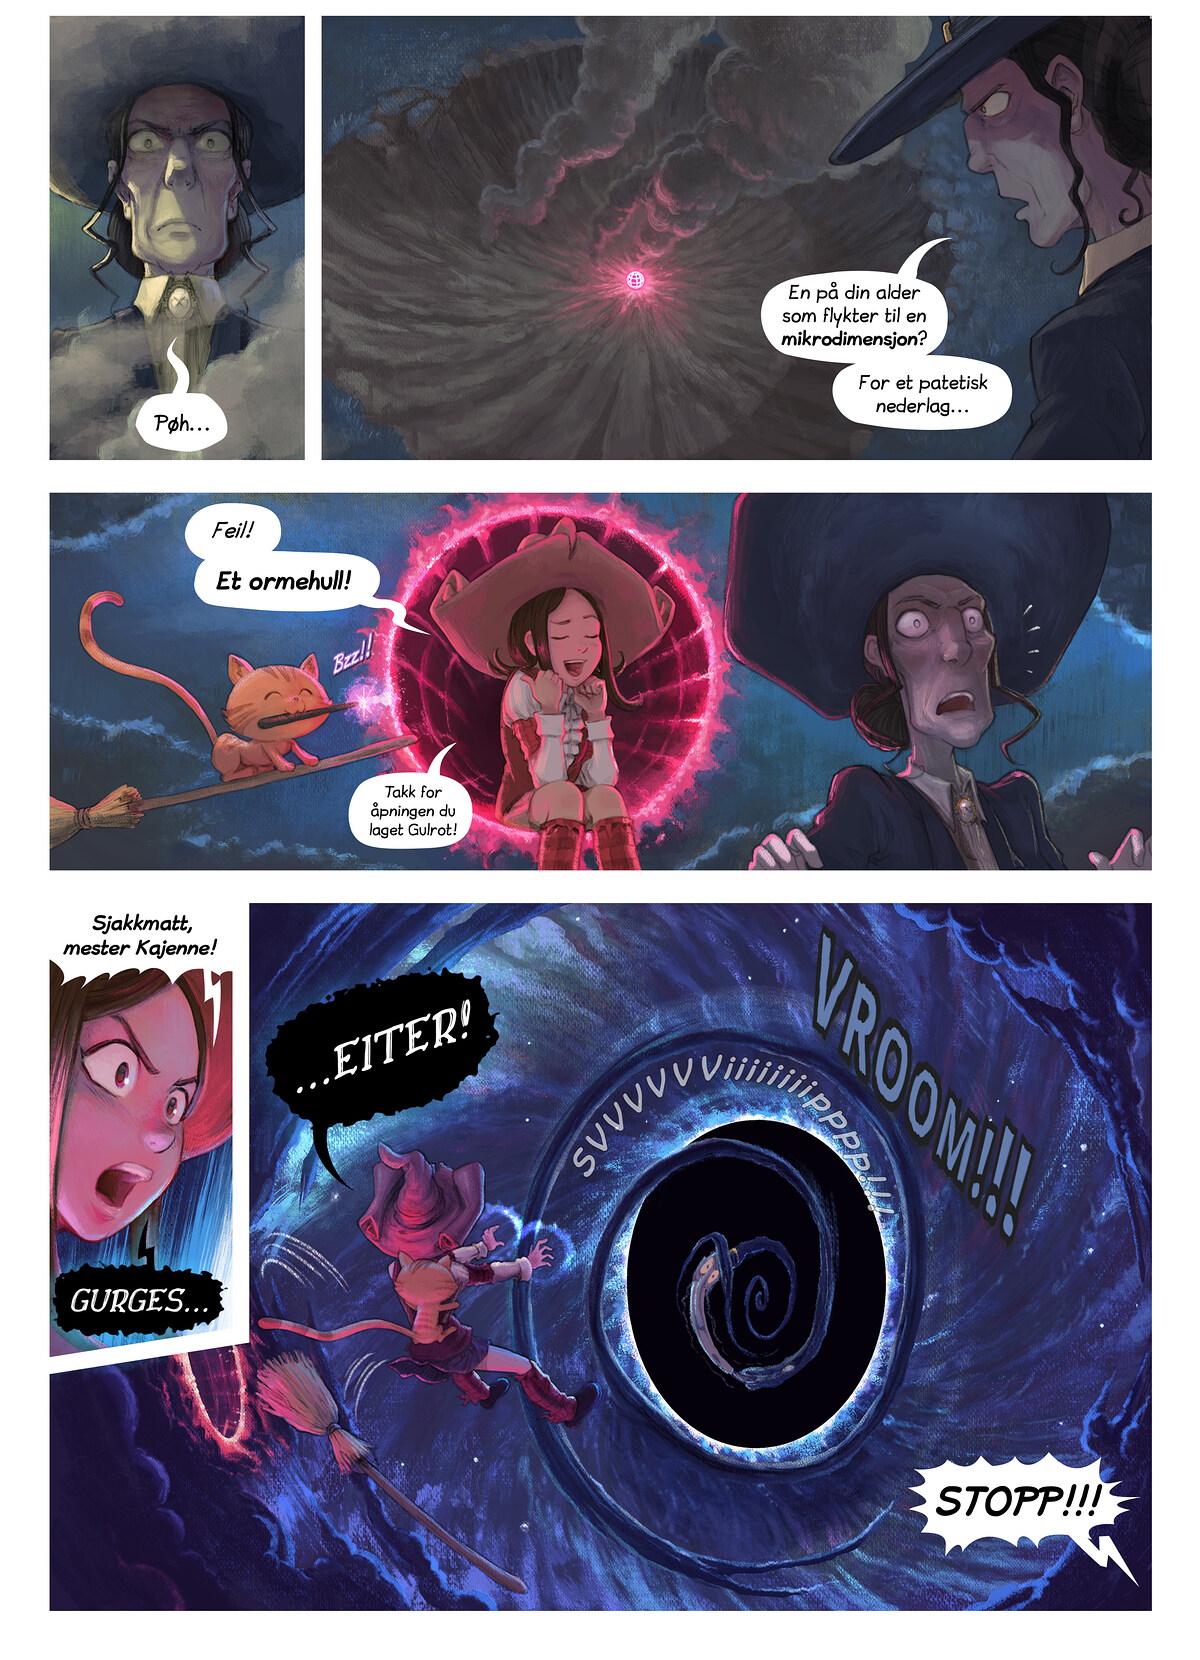 Episode 31: Den store kampen, Page 5